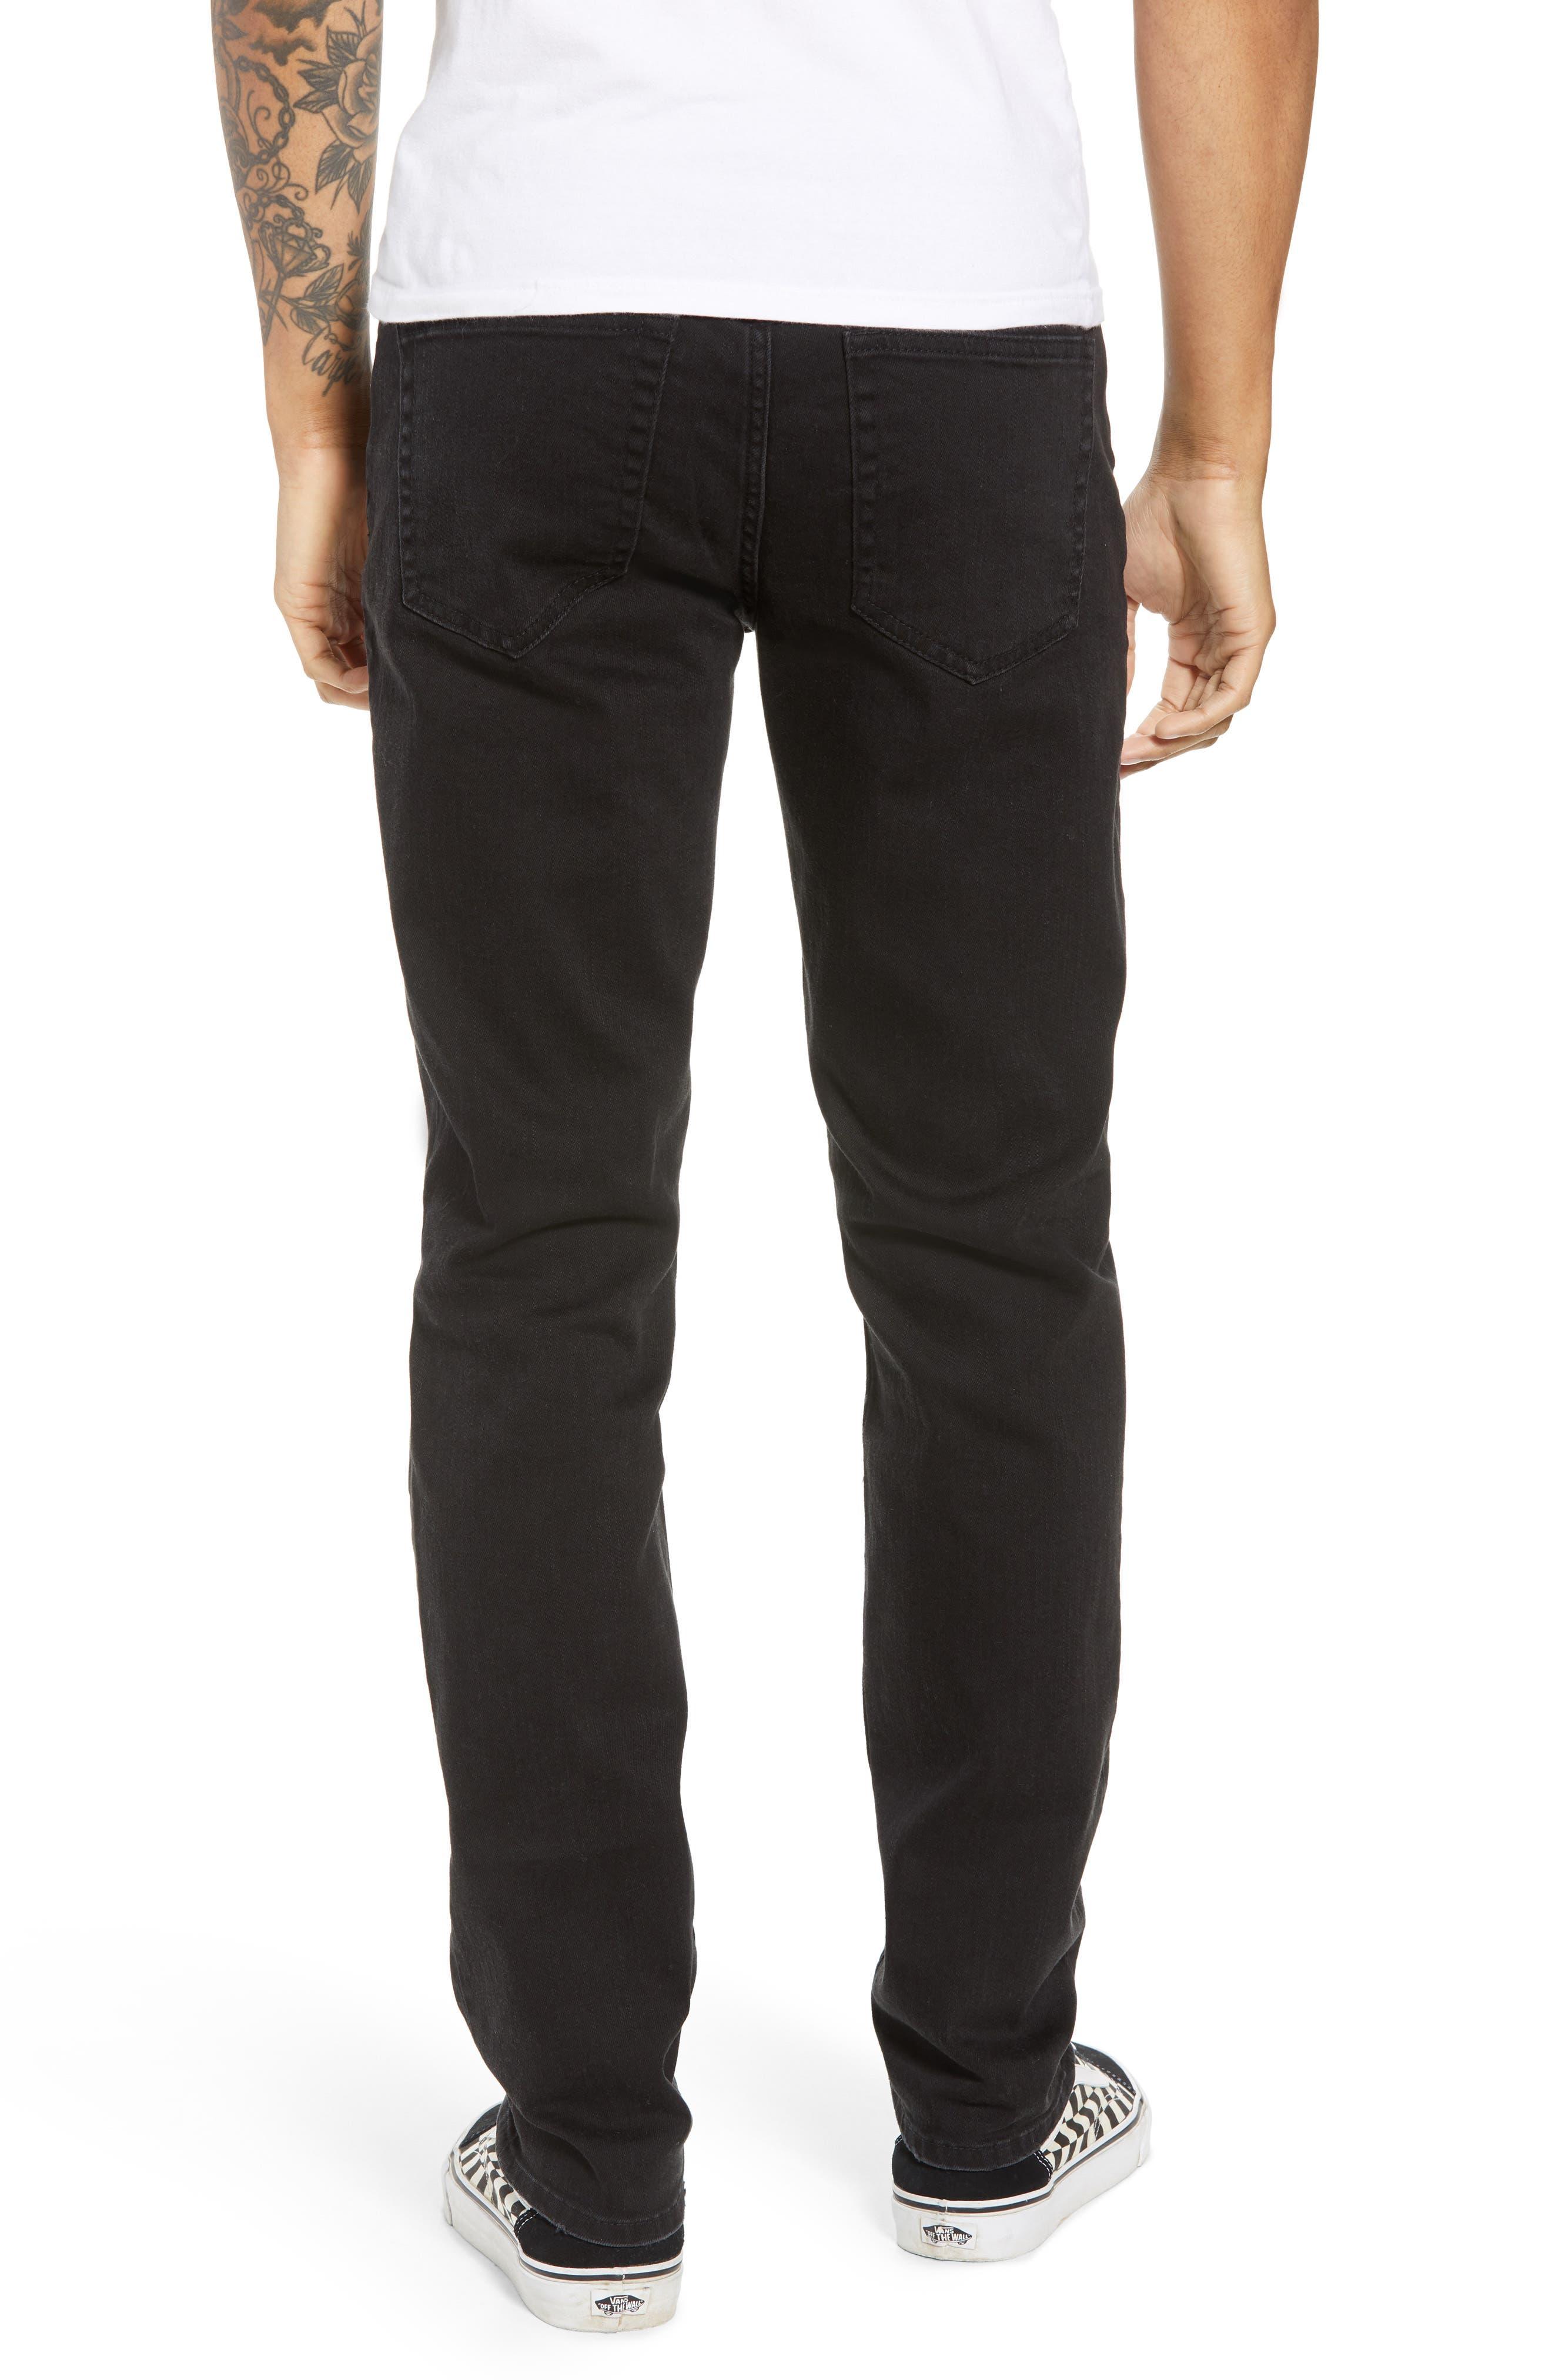 THE RAIL, Ripped Skinny Jeans, Alternate thumbnail 2, color, BLACK STONE WASH